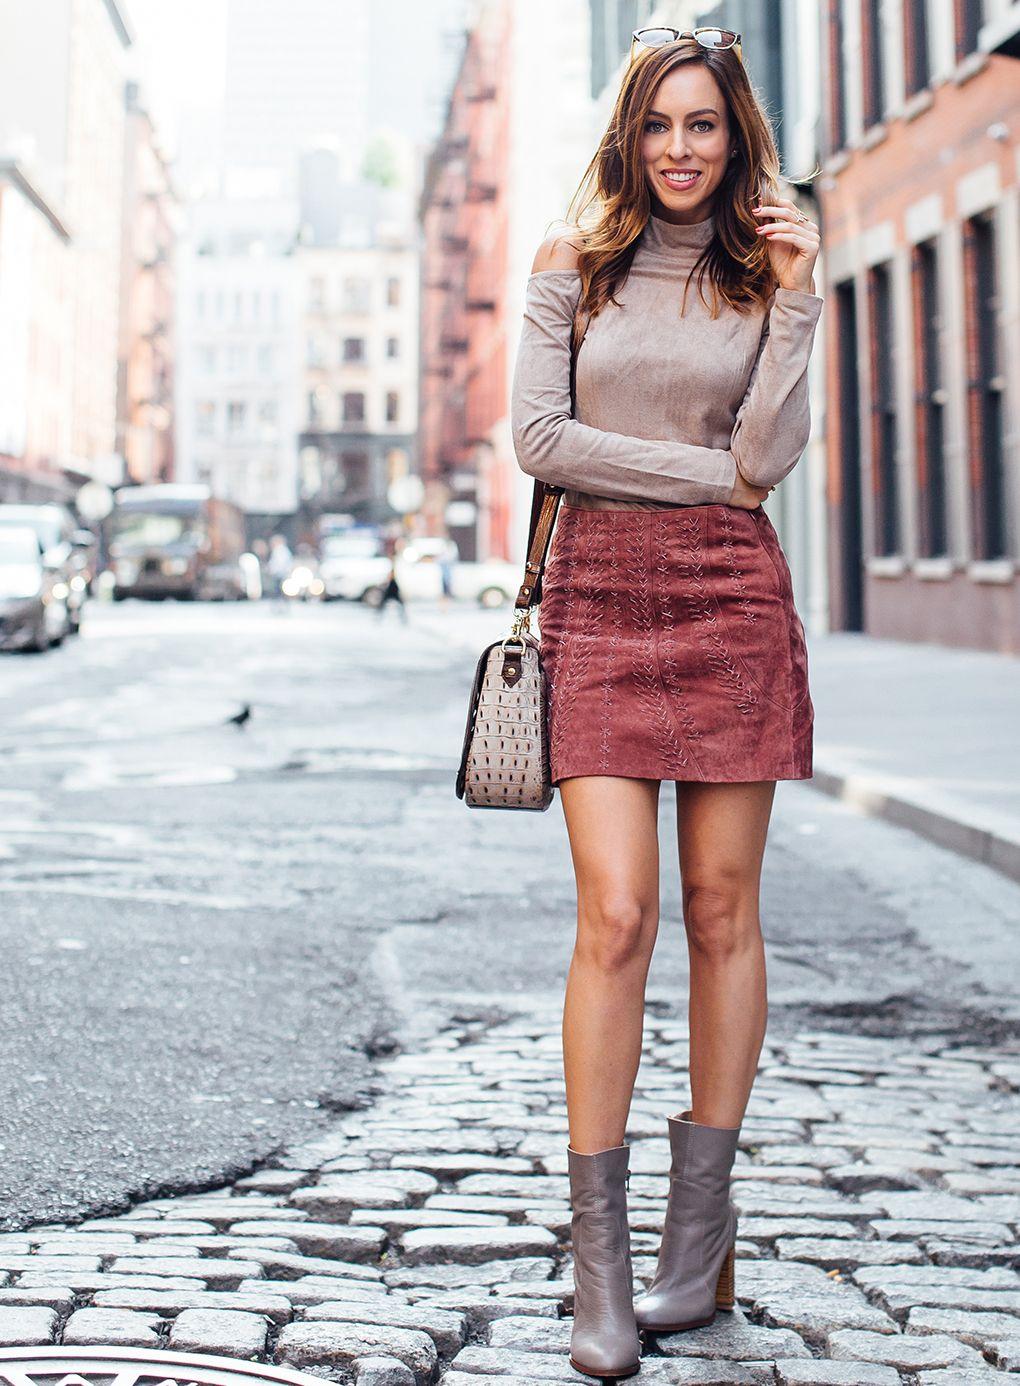 9e360f767 Los Angeles fashion blogger Sydne Summer street styles a swede mini skirt  for the fall season.